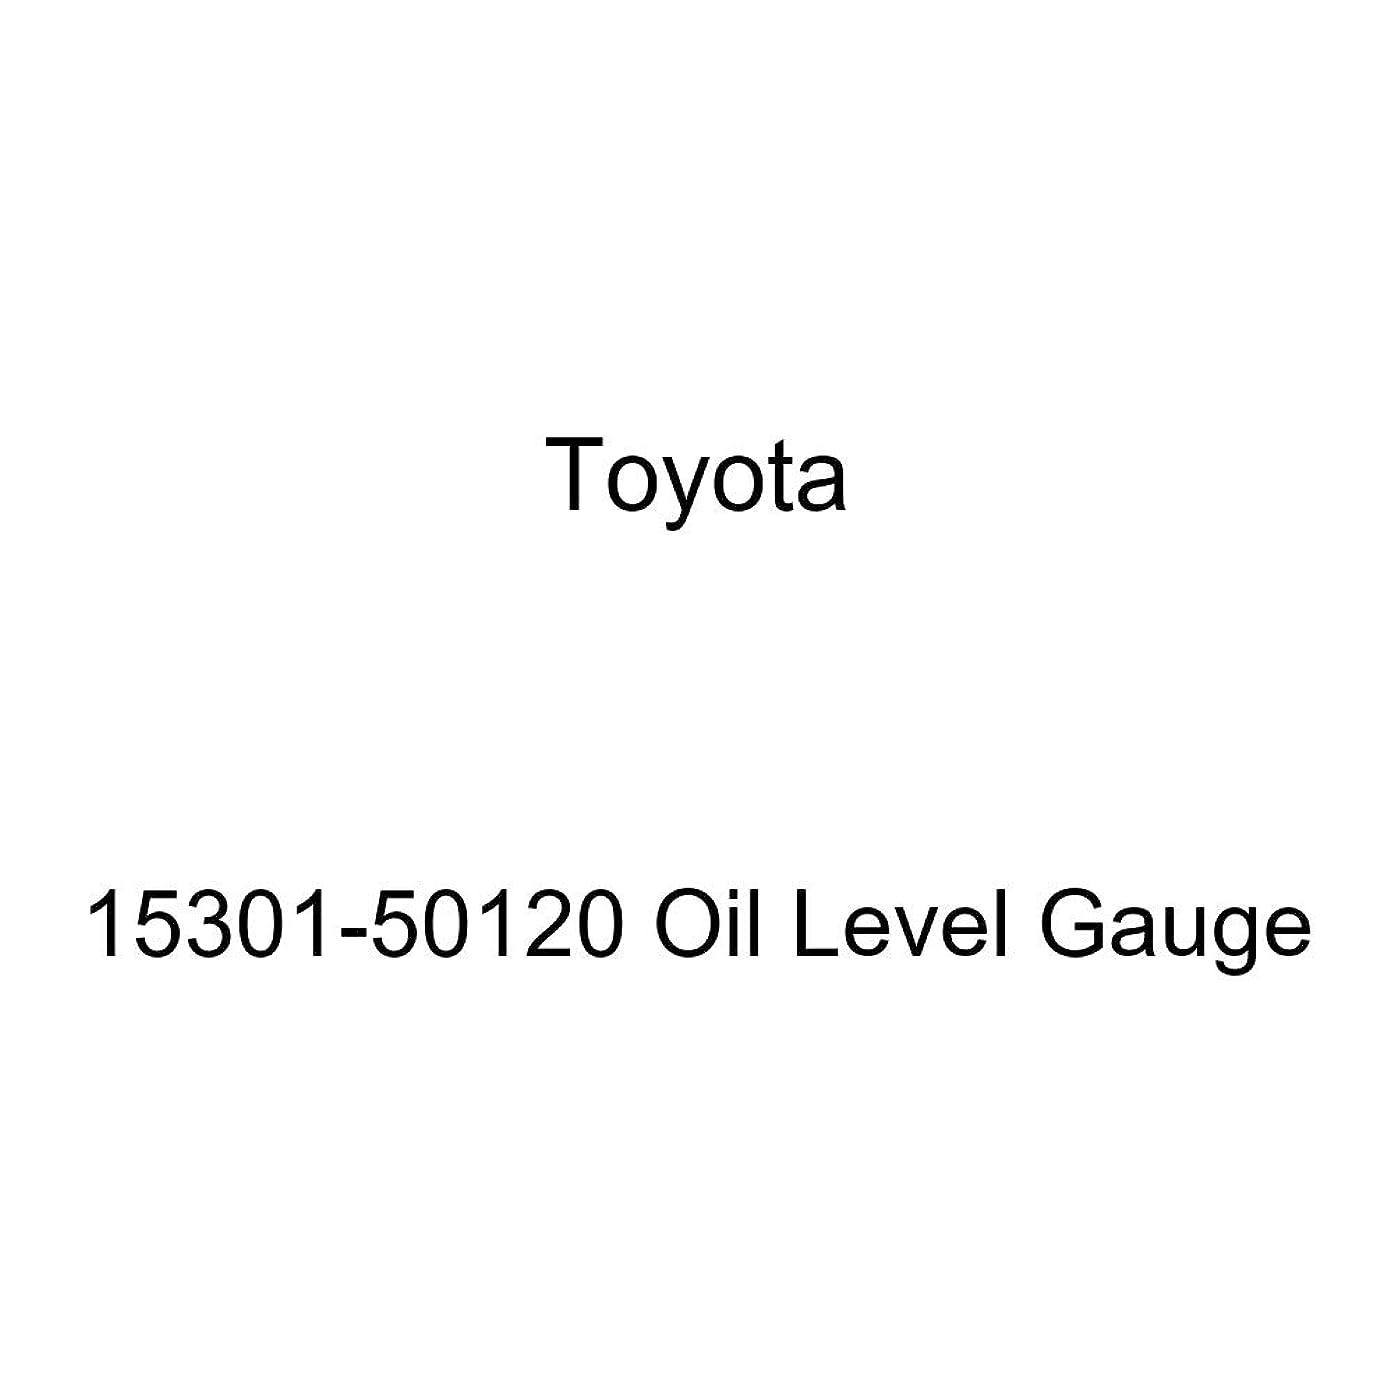 TOYOTA 15301-50120 Oil Level Gauge